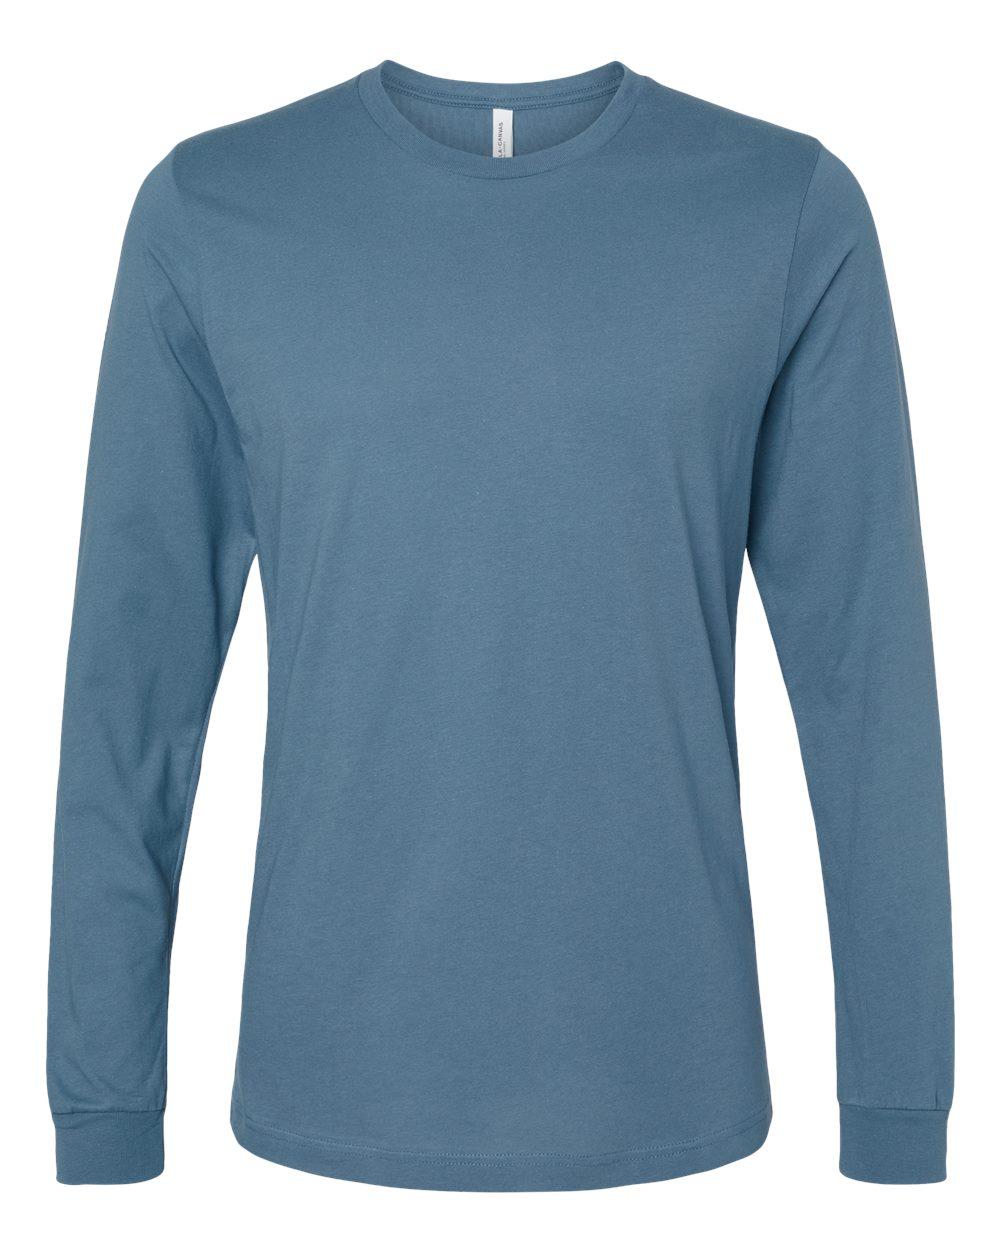 Bella-Canvas-Mens-Blank-Top-Long-Sleeve-Jersey-Tee-T-Shirt-3501-up-to-3XL thumbnail 55